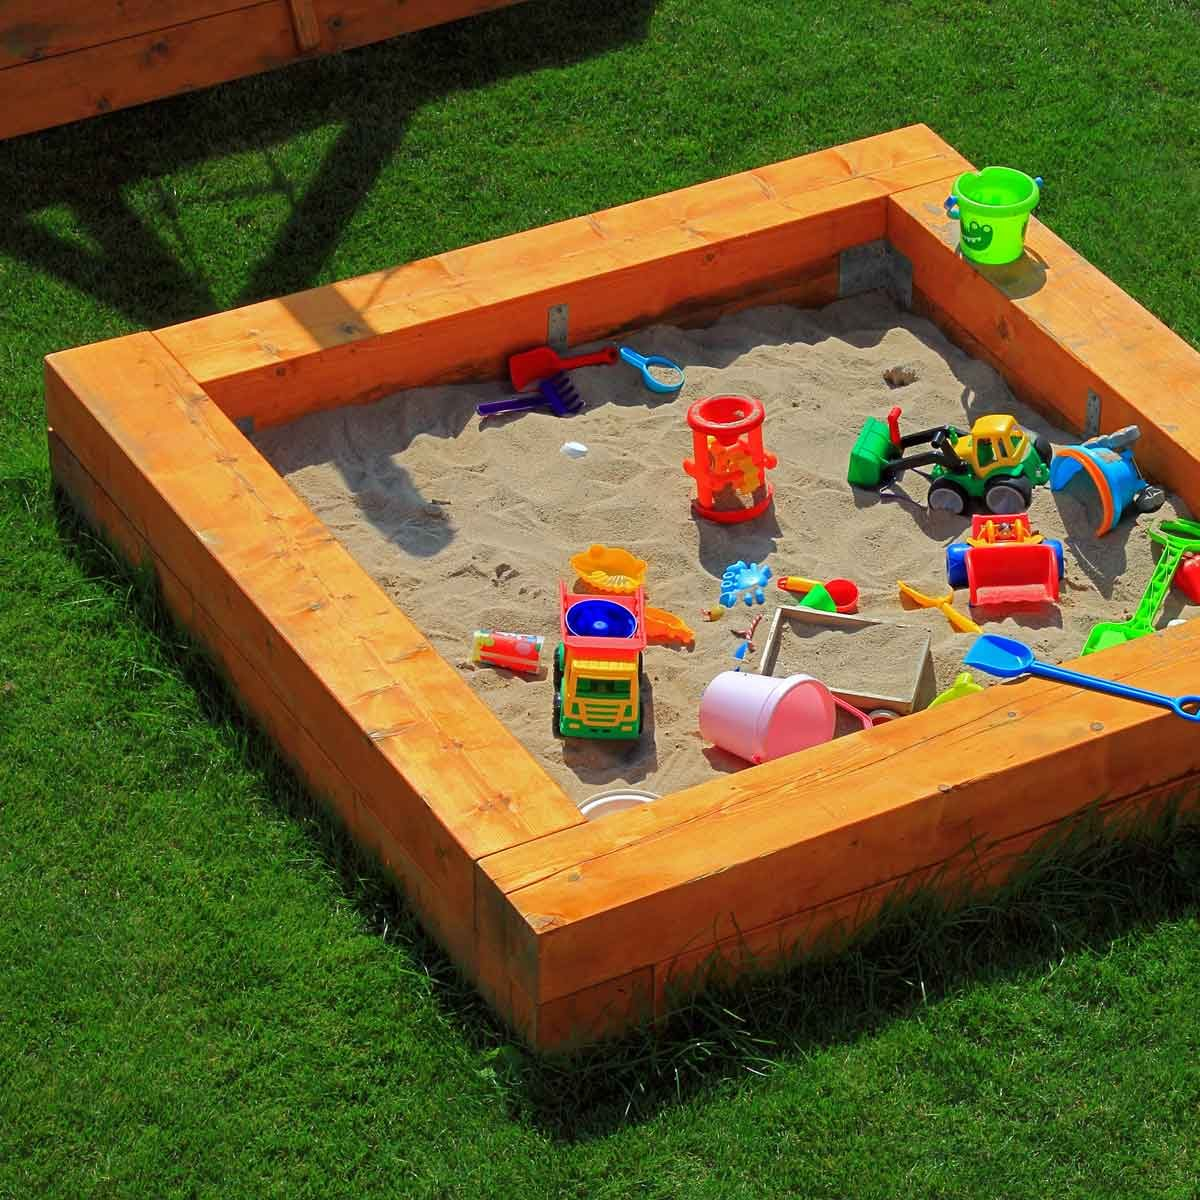 Sandbox with toys